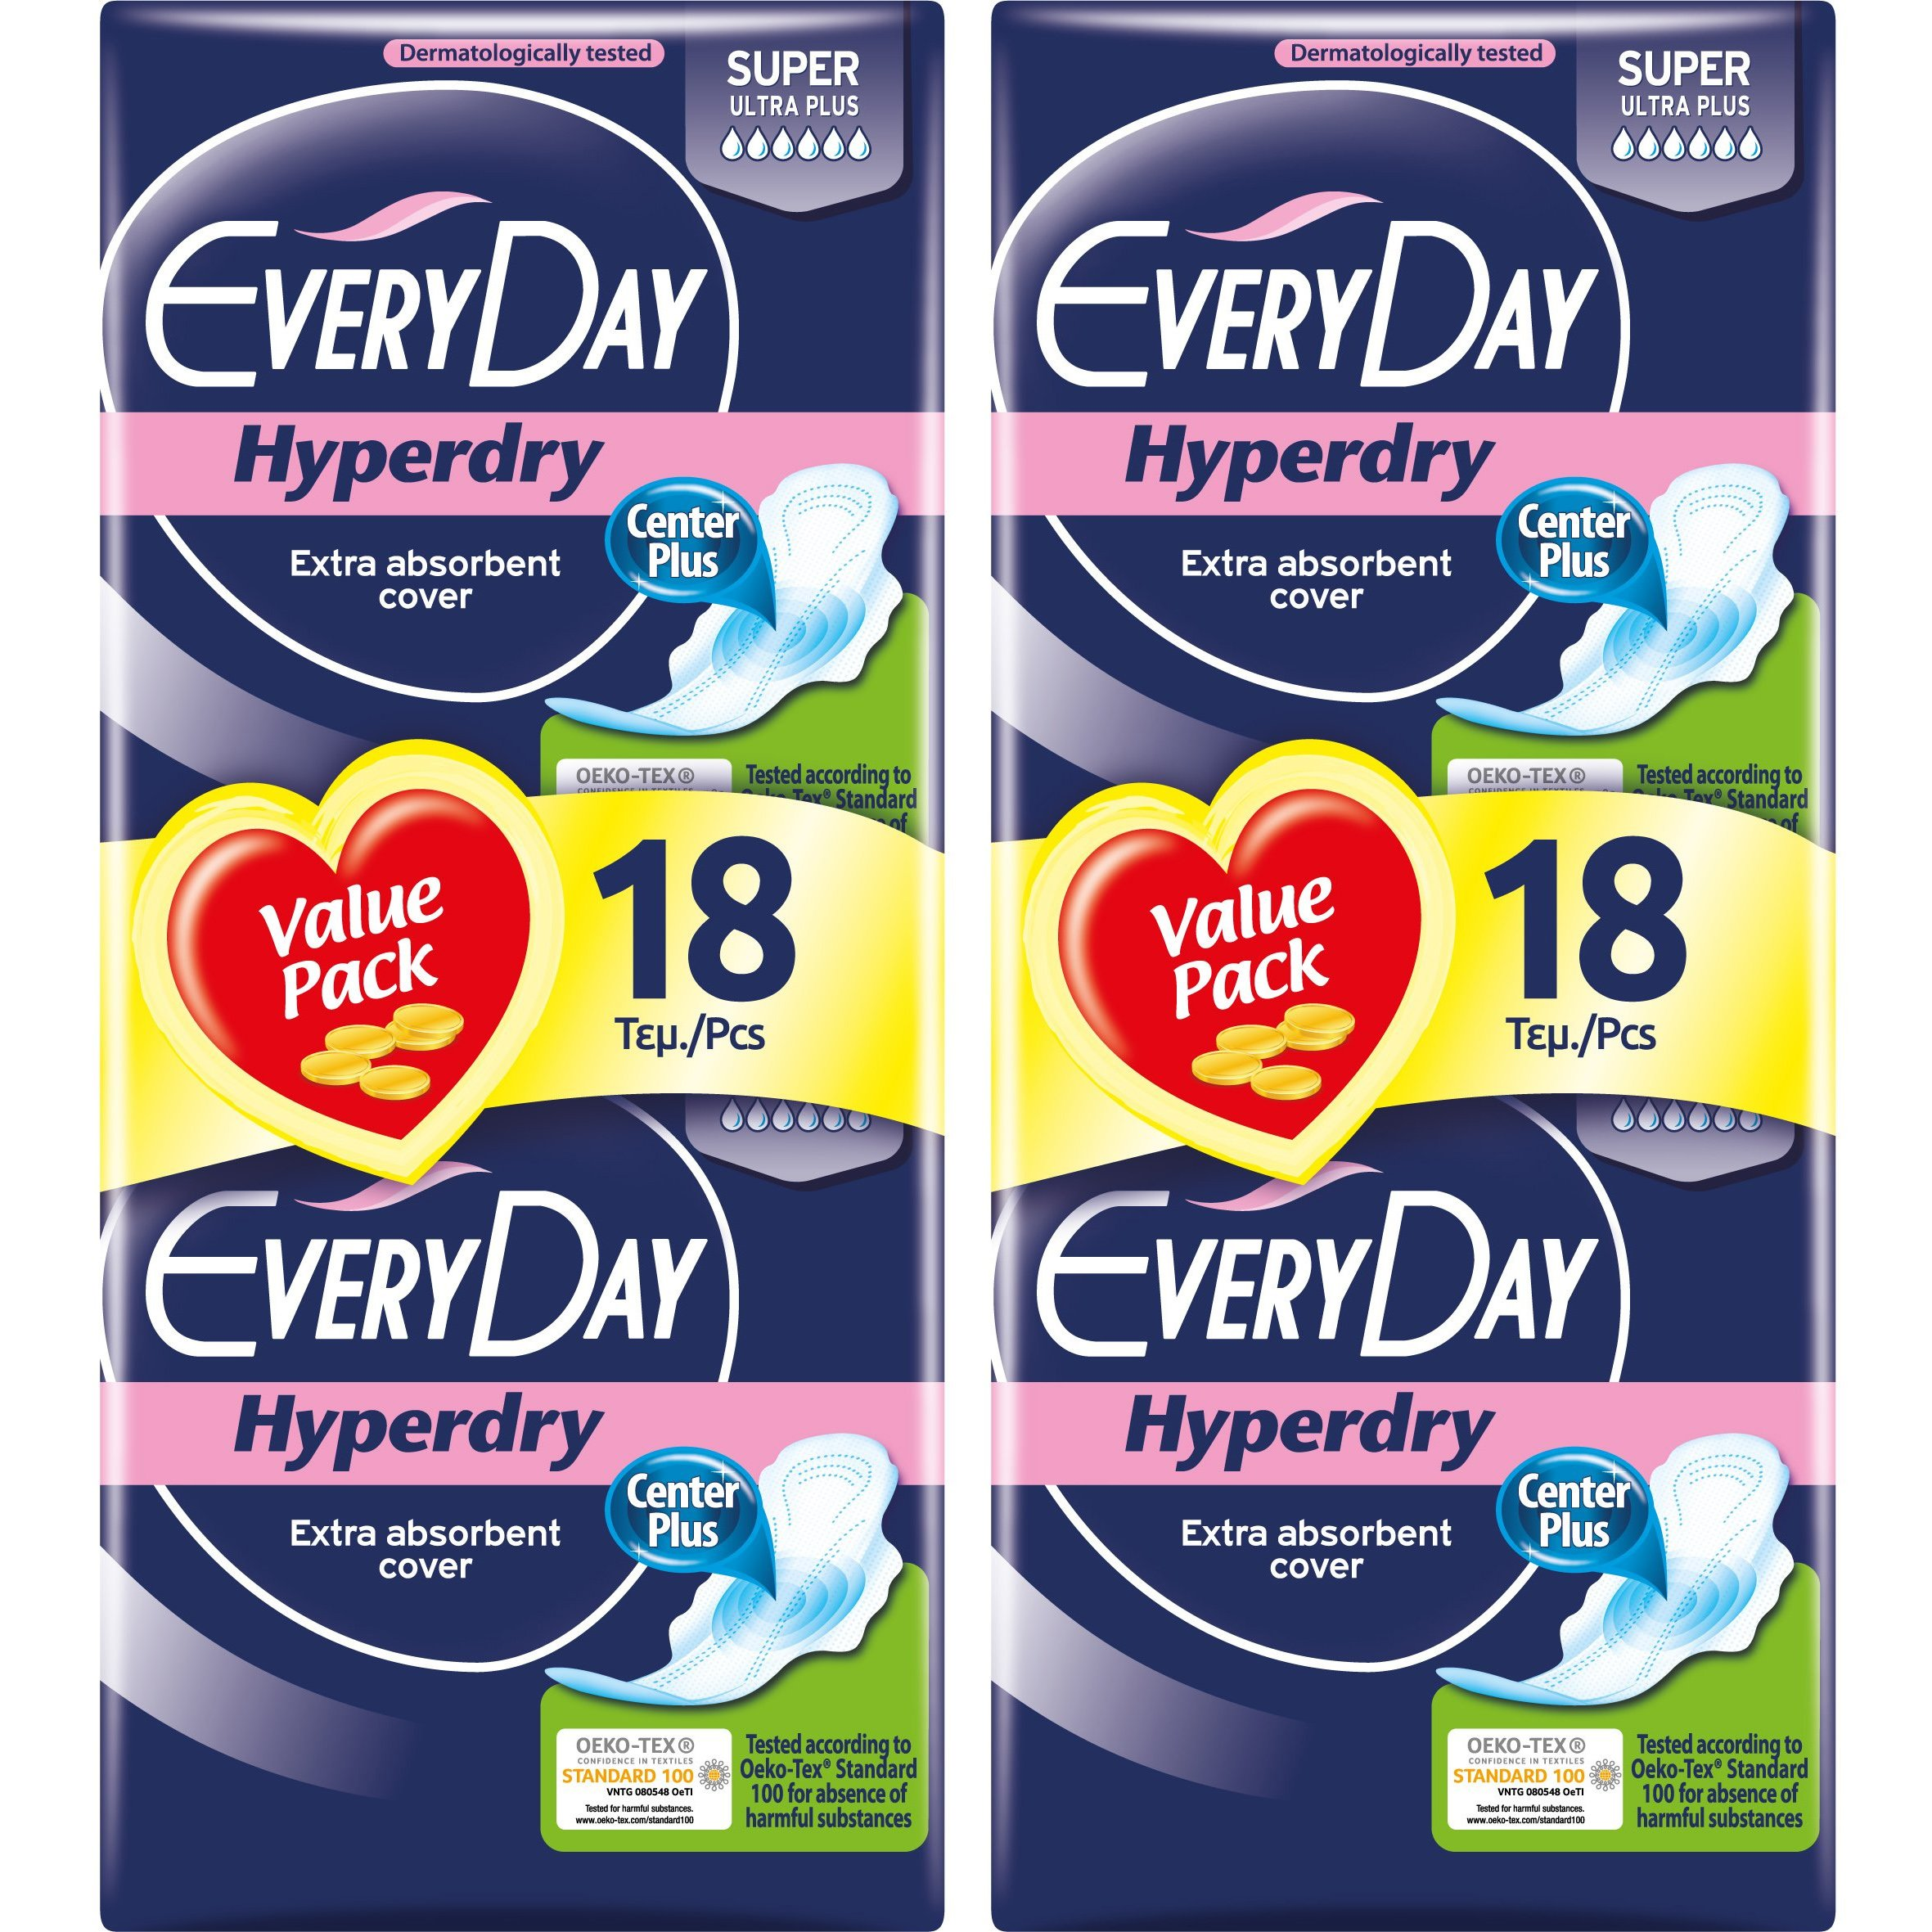 Every Day Πακέτο Προσφοράς Hyperdry Super Ultra Plus Value Pack Σερβιέτες Ιδανικές για Πολύ Μεγάλη Ροή 2×18 Τεμάχια 1+1 Δώρο